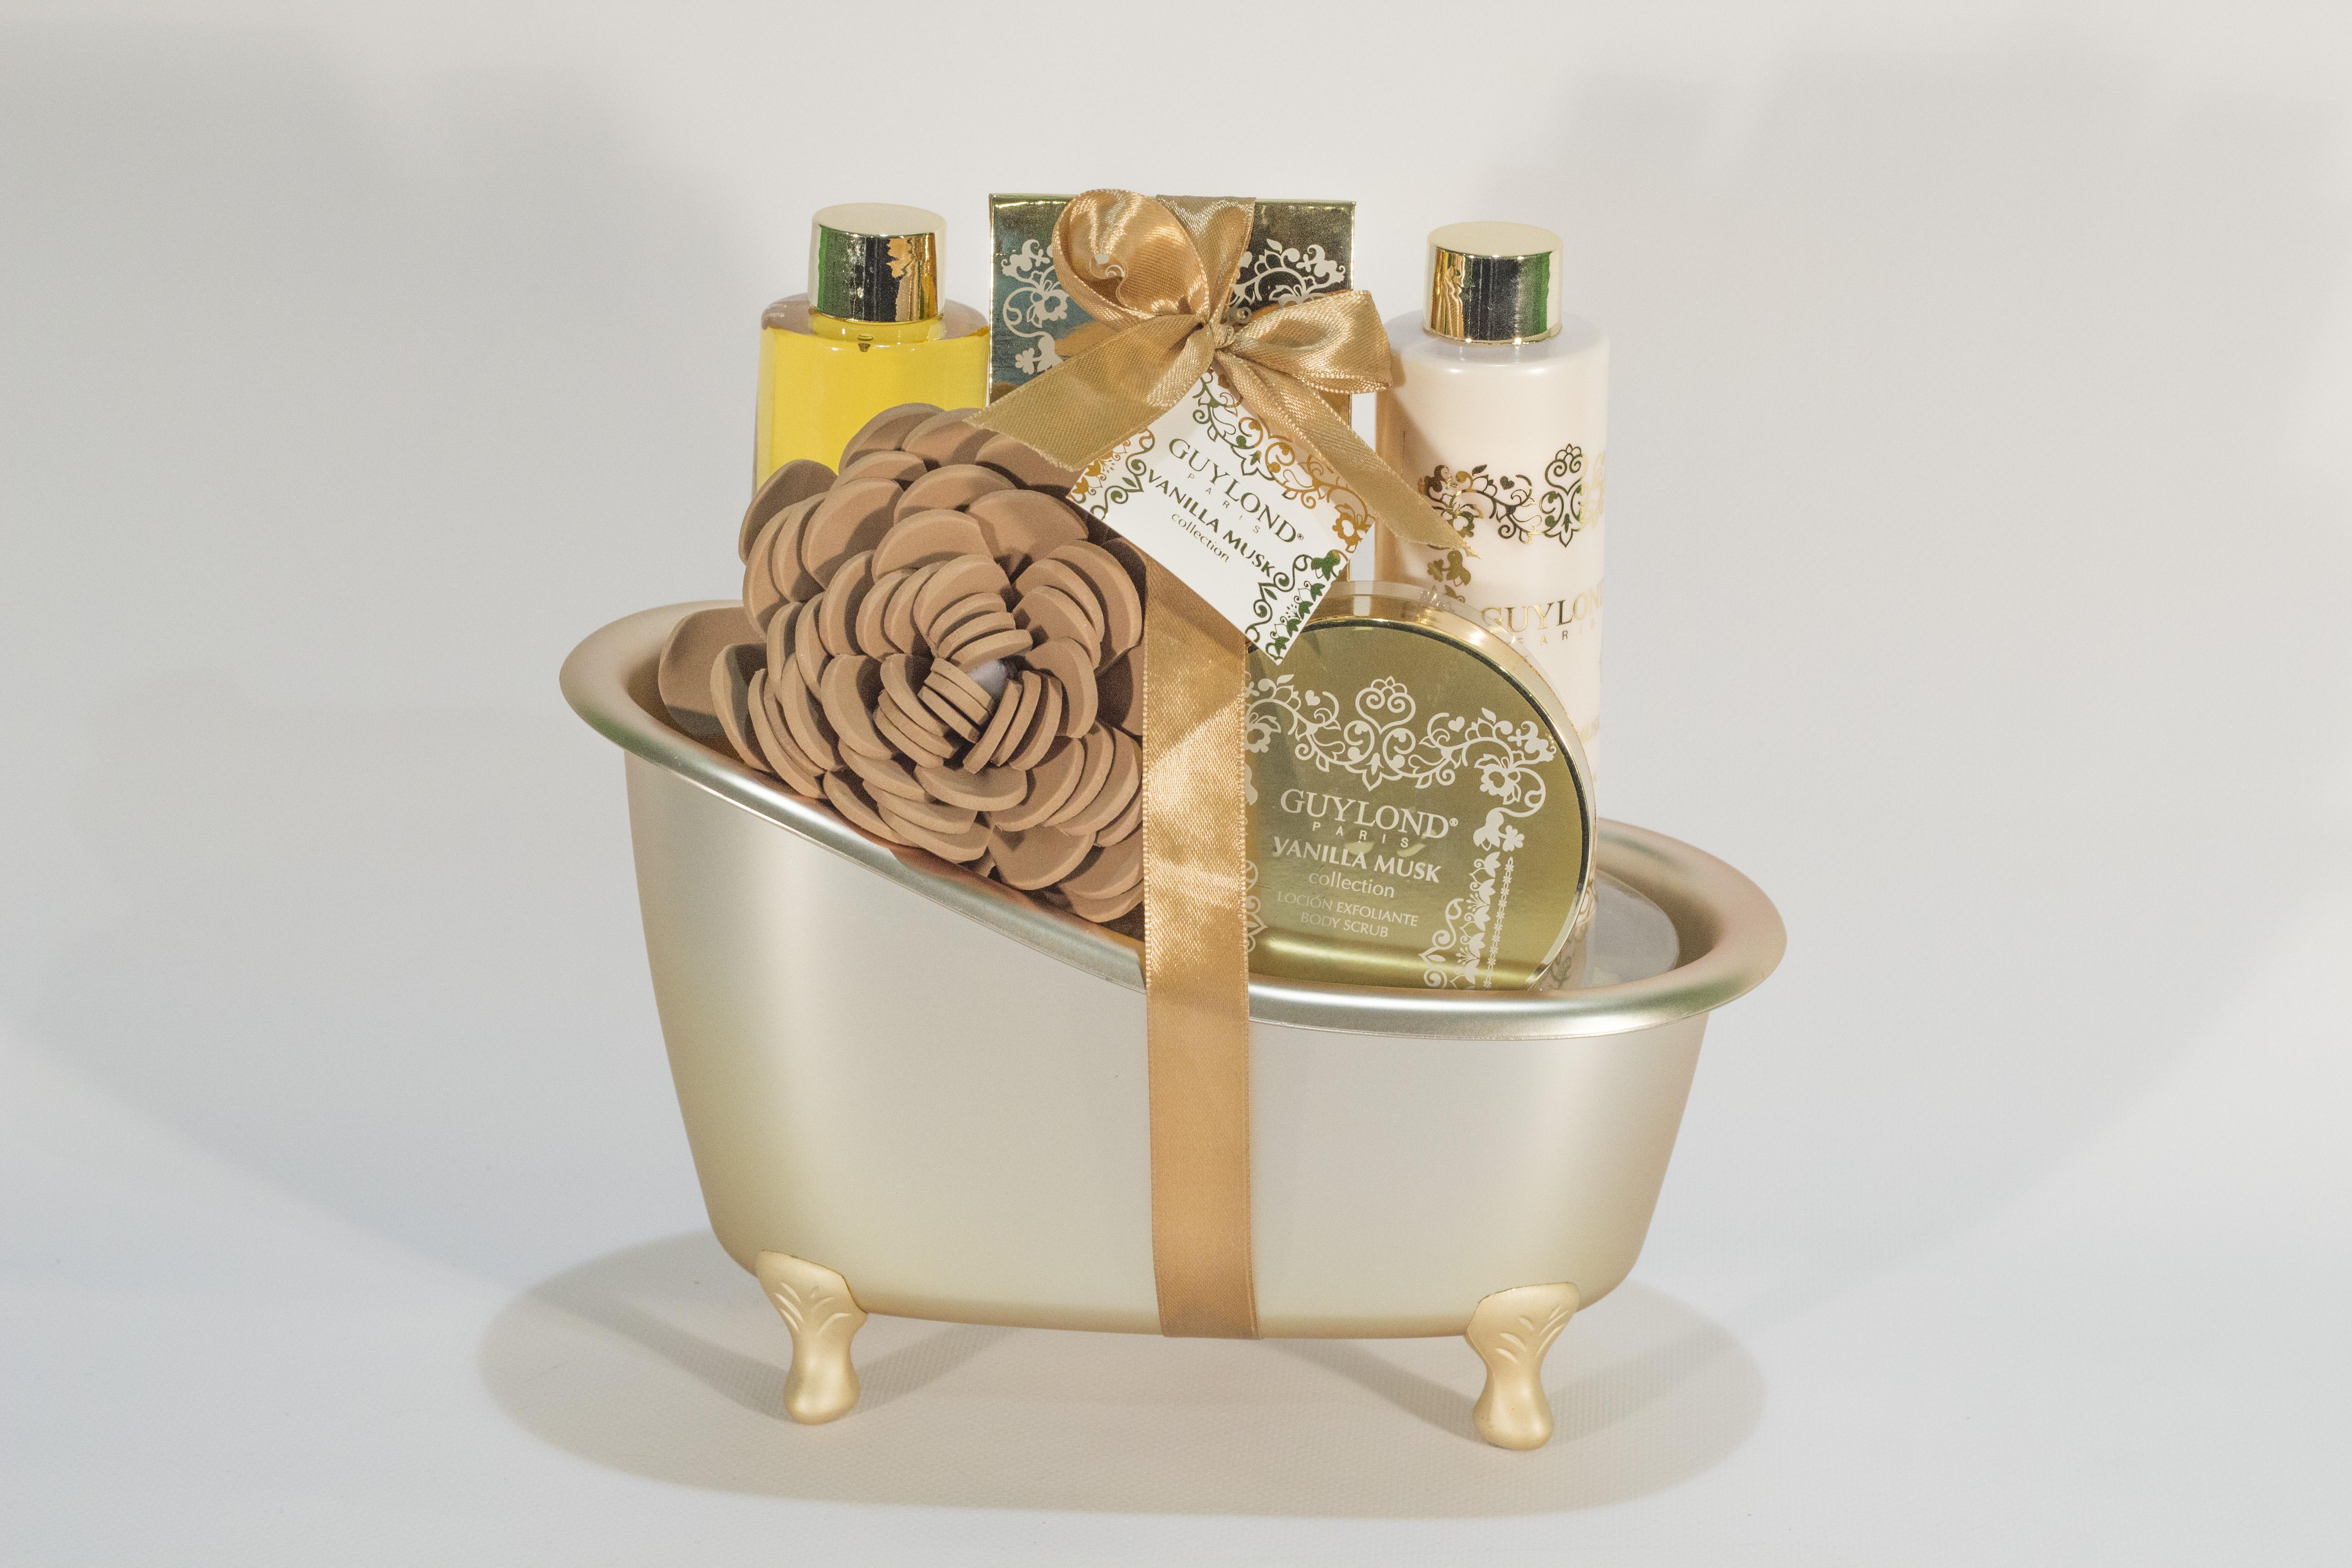 Set De Baño Relajante:Set de baño